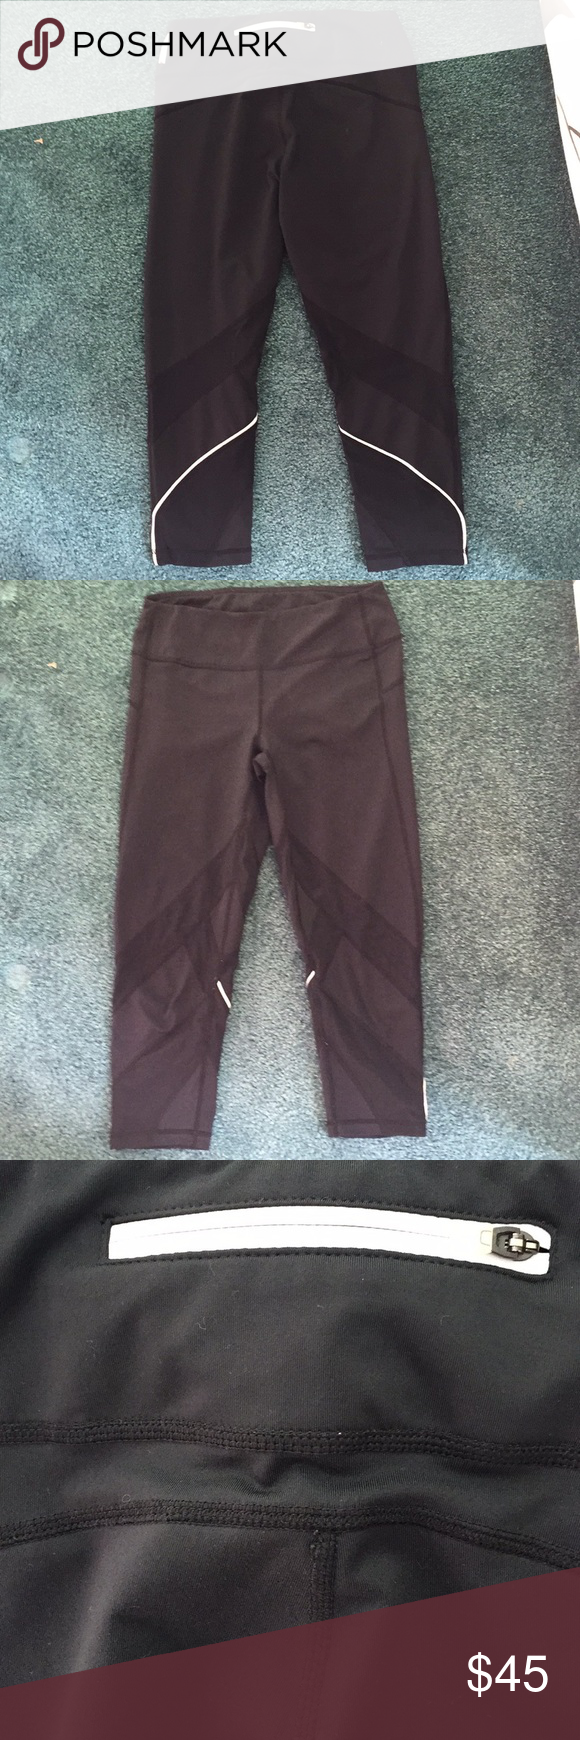 Zella Leggings Zella leggings, Clothes design, Women